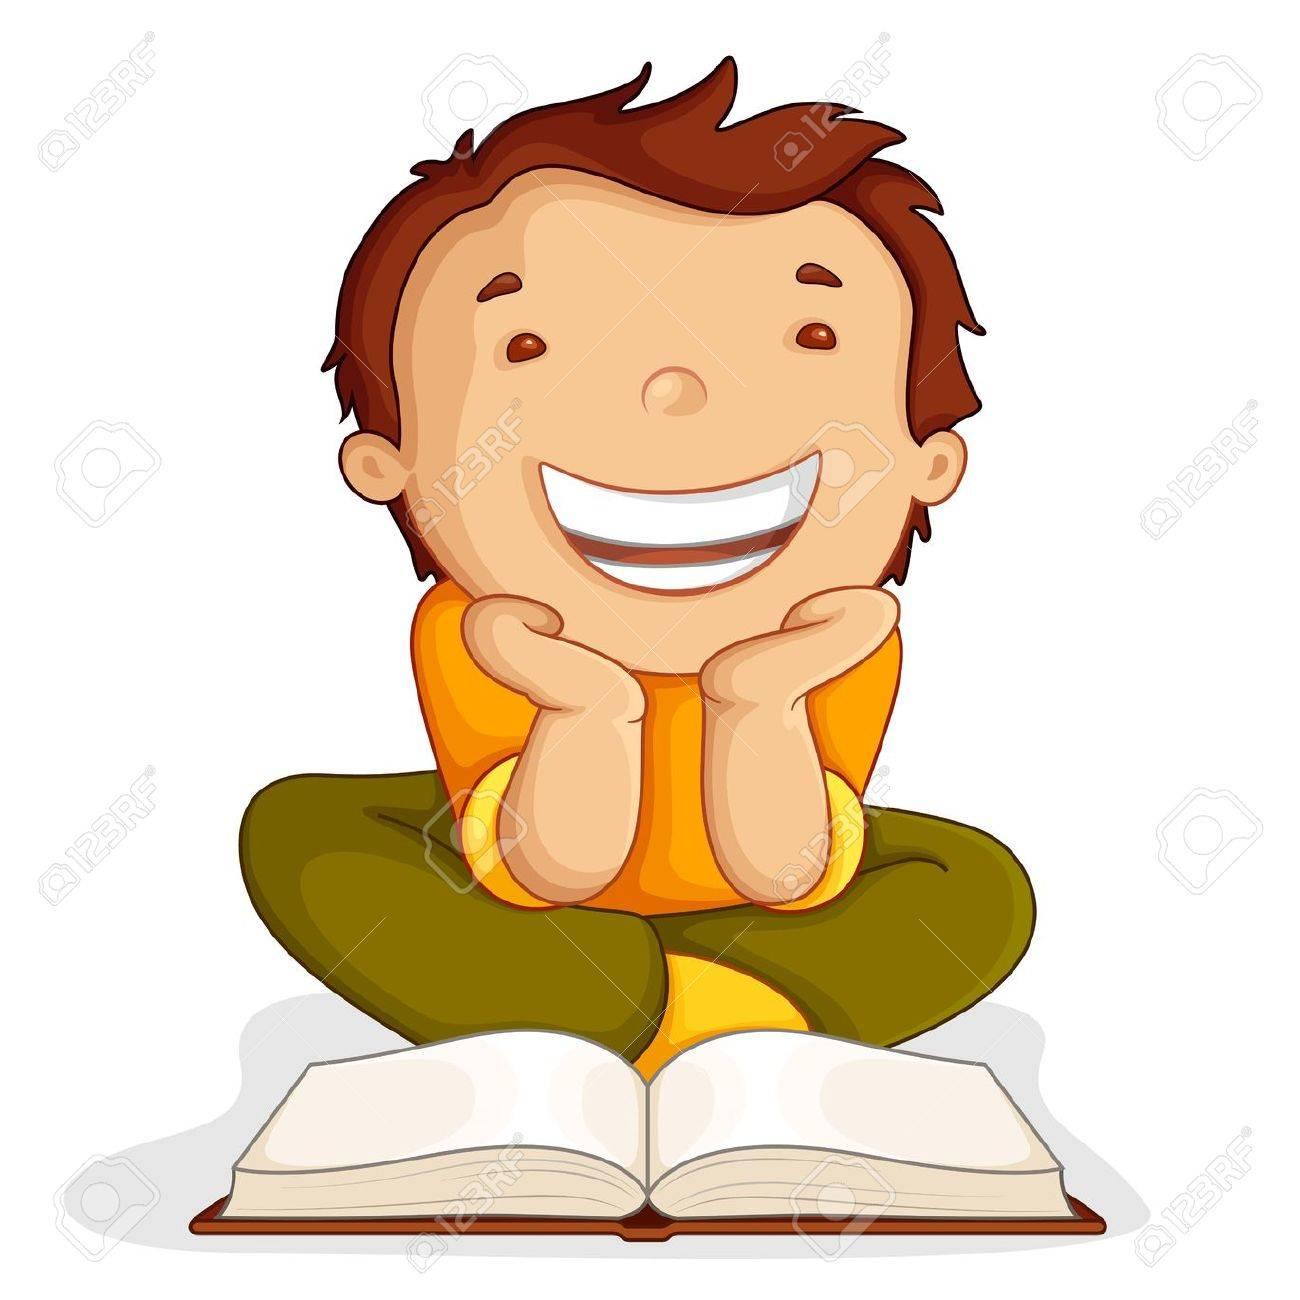 Kid reading Open Book Stock Vector - 14315259